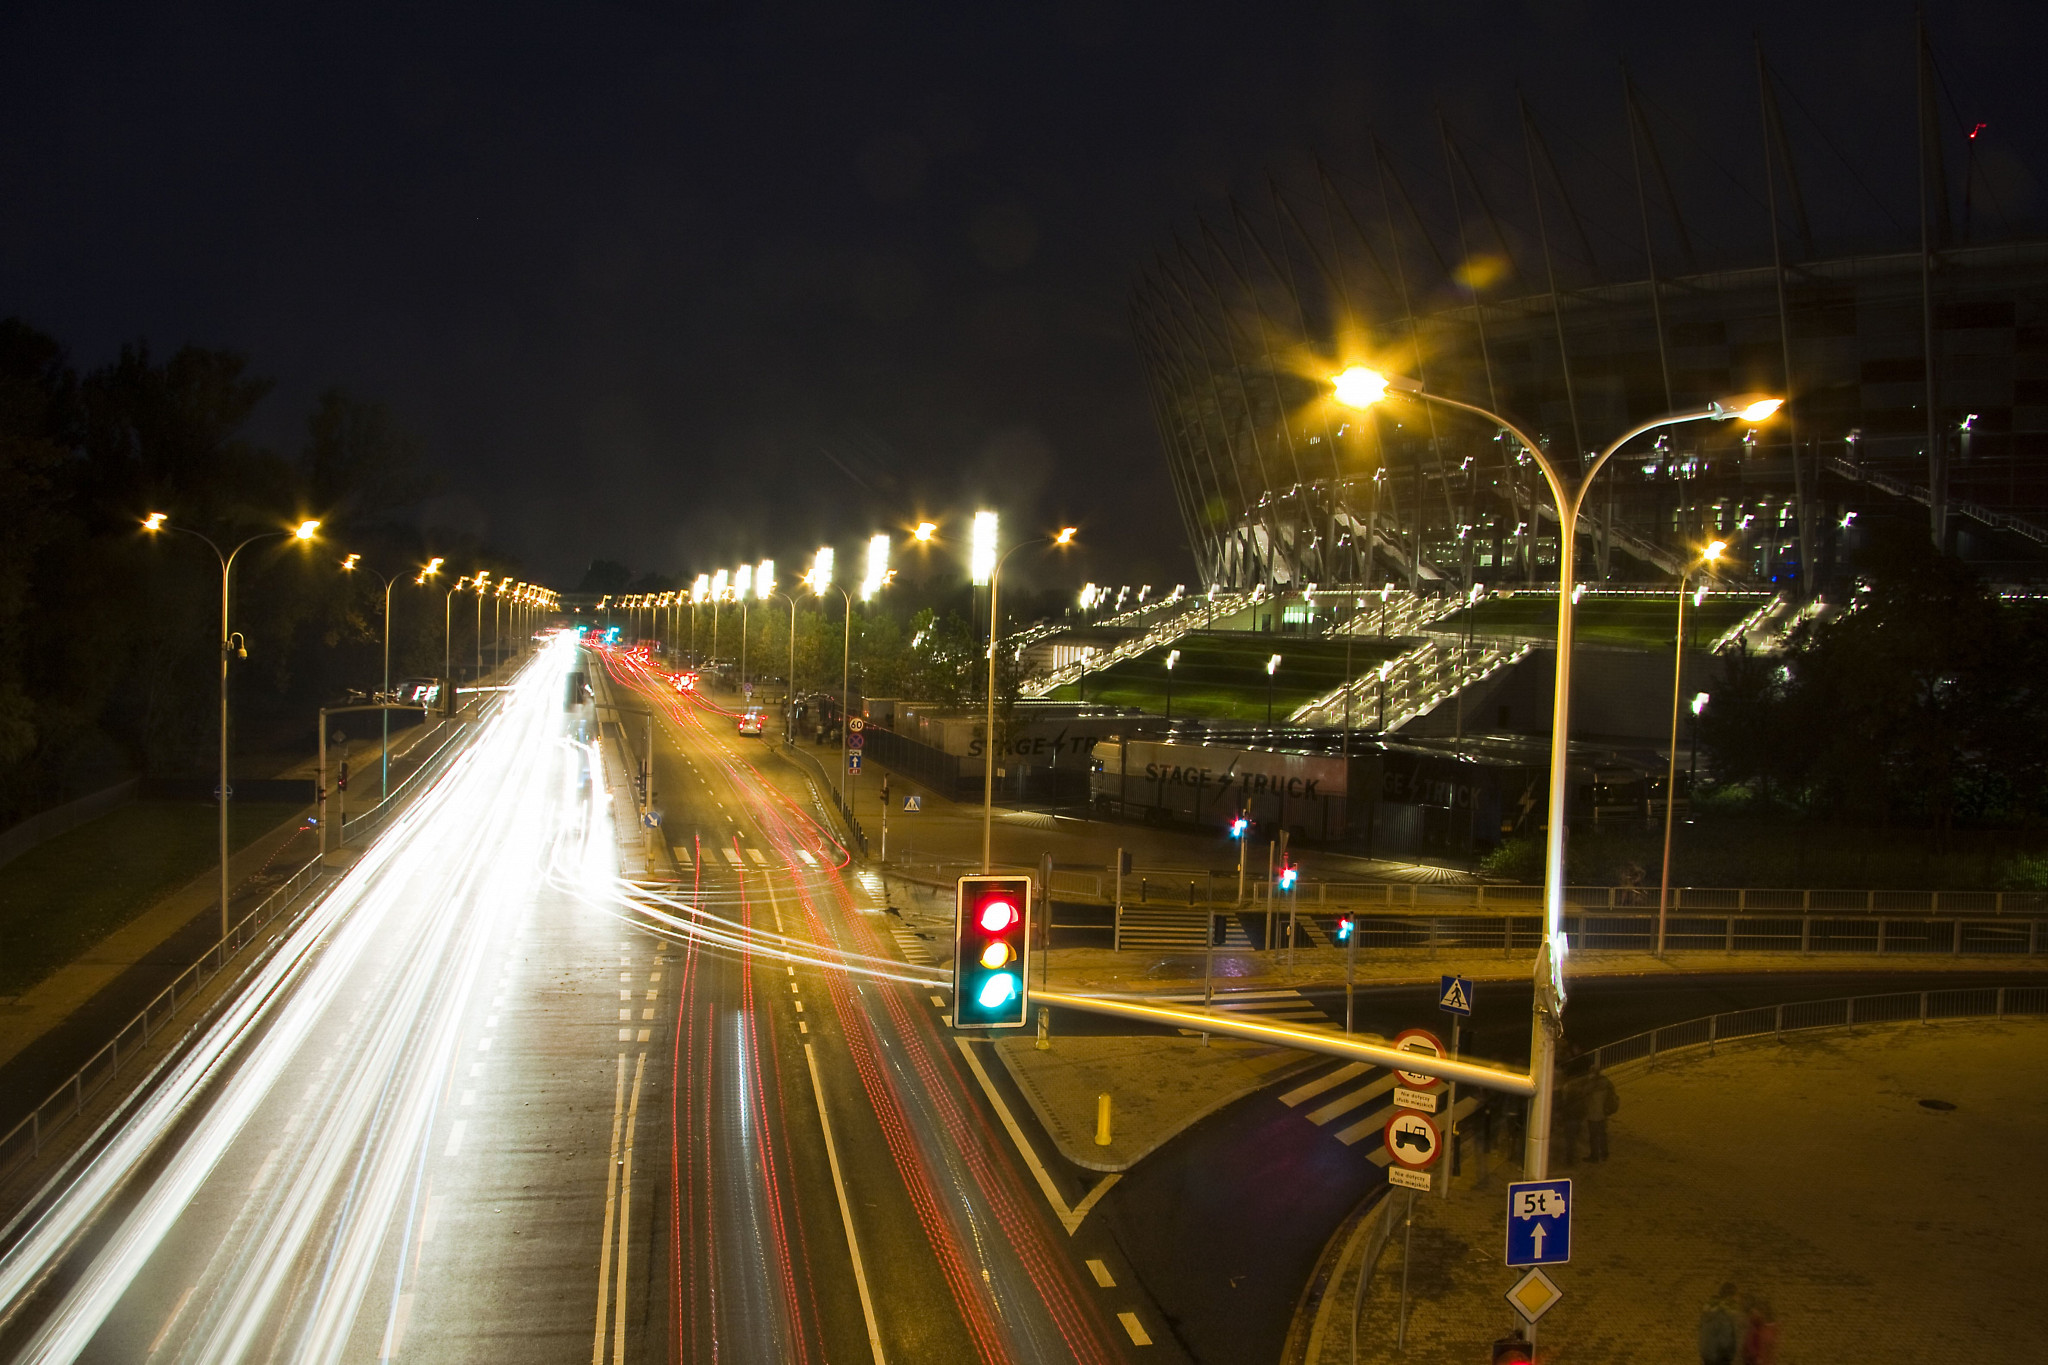 Long exposure over road